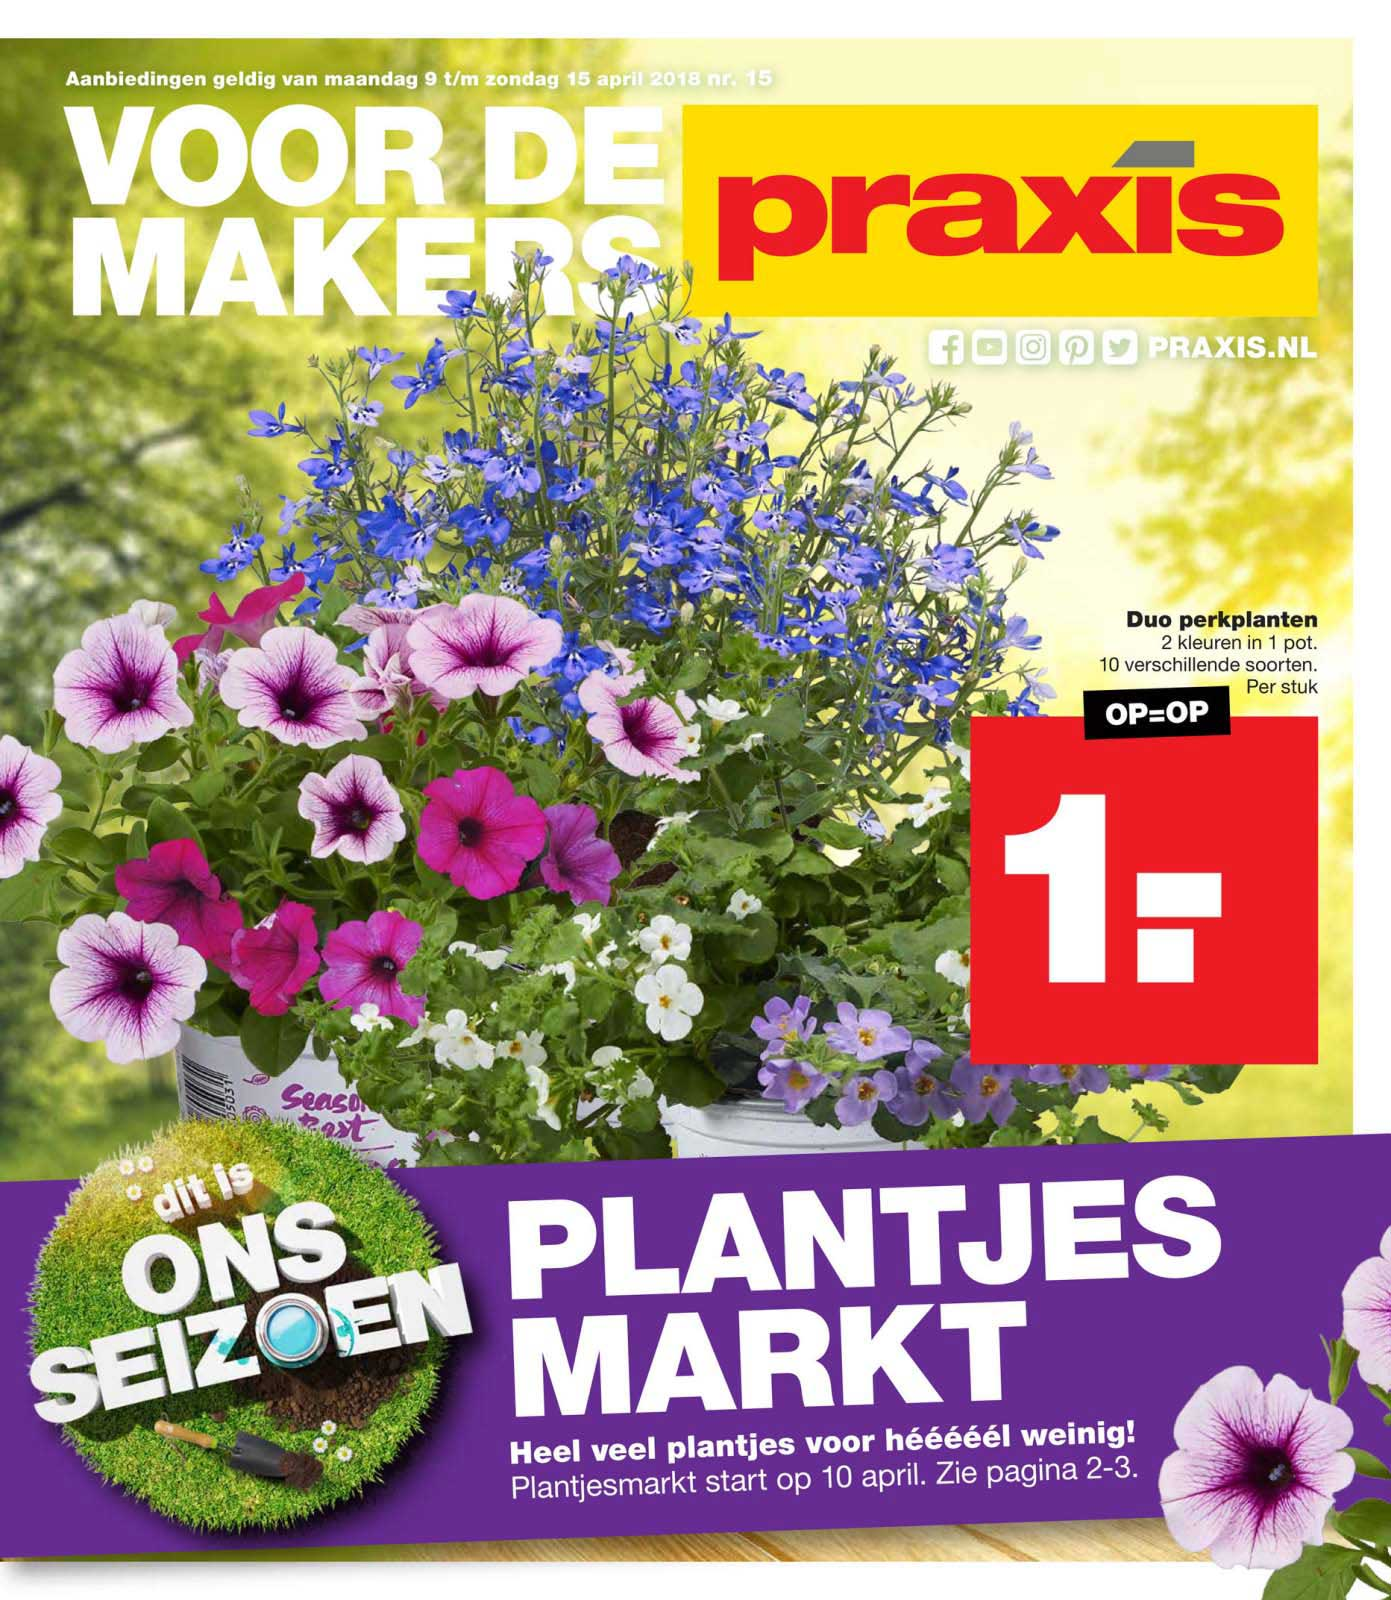 Praxis Duo Perkplanten: €1,-